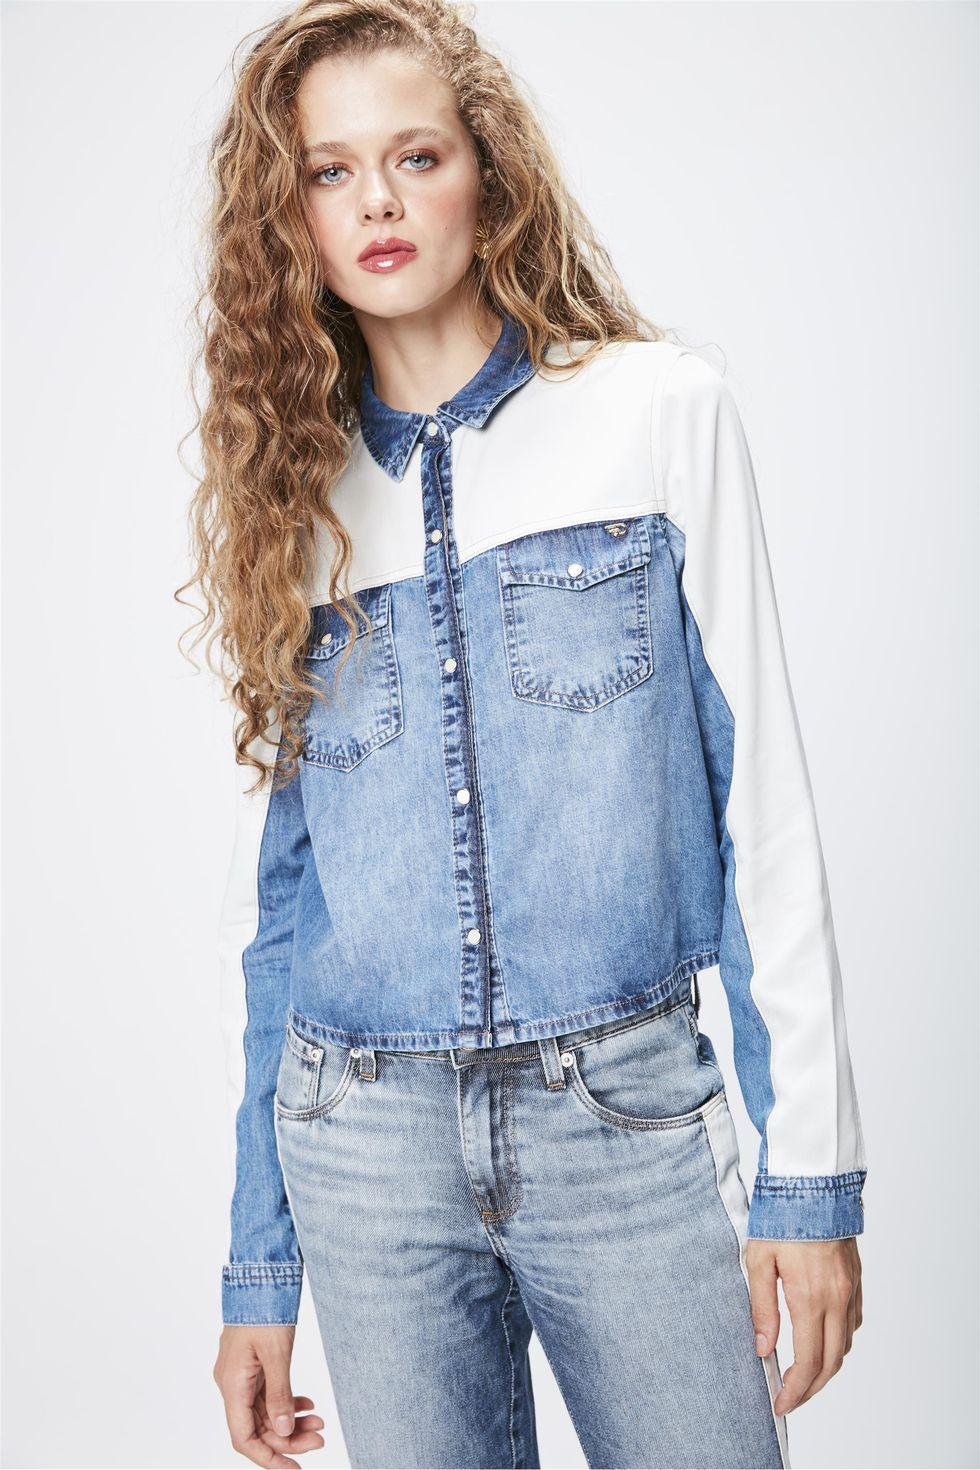 Camisa-Jeans-com-Recortes-Feminina-Frente--